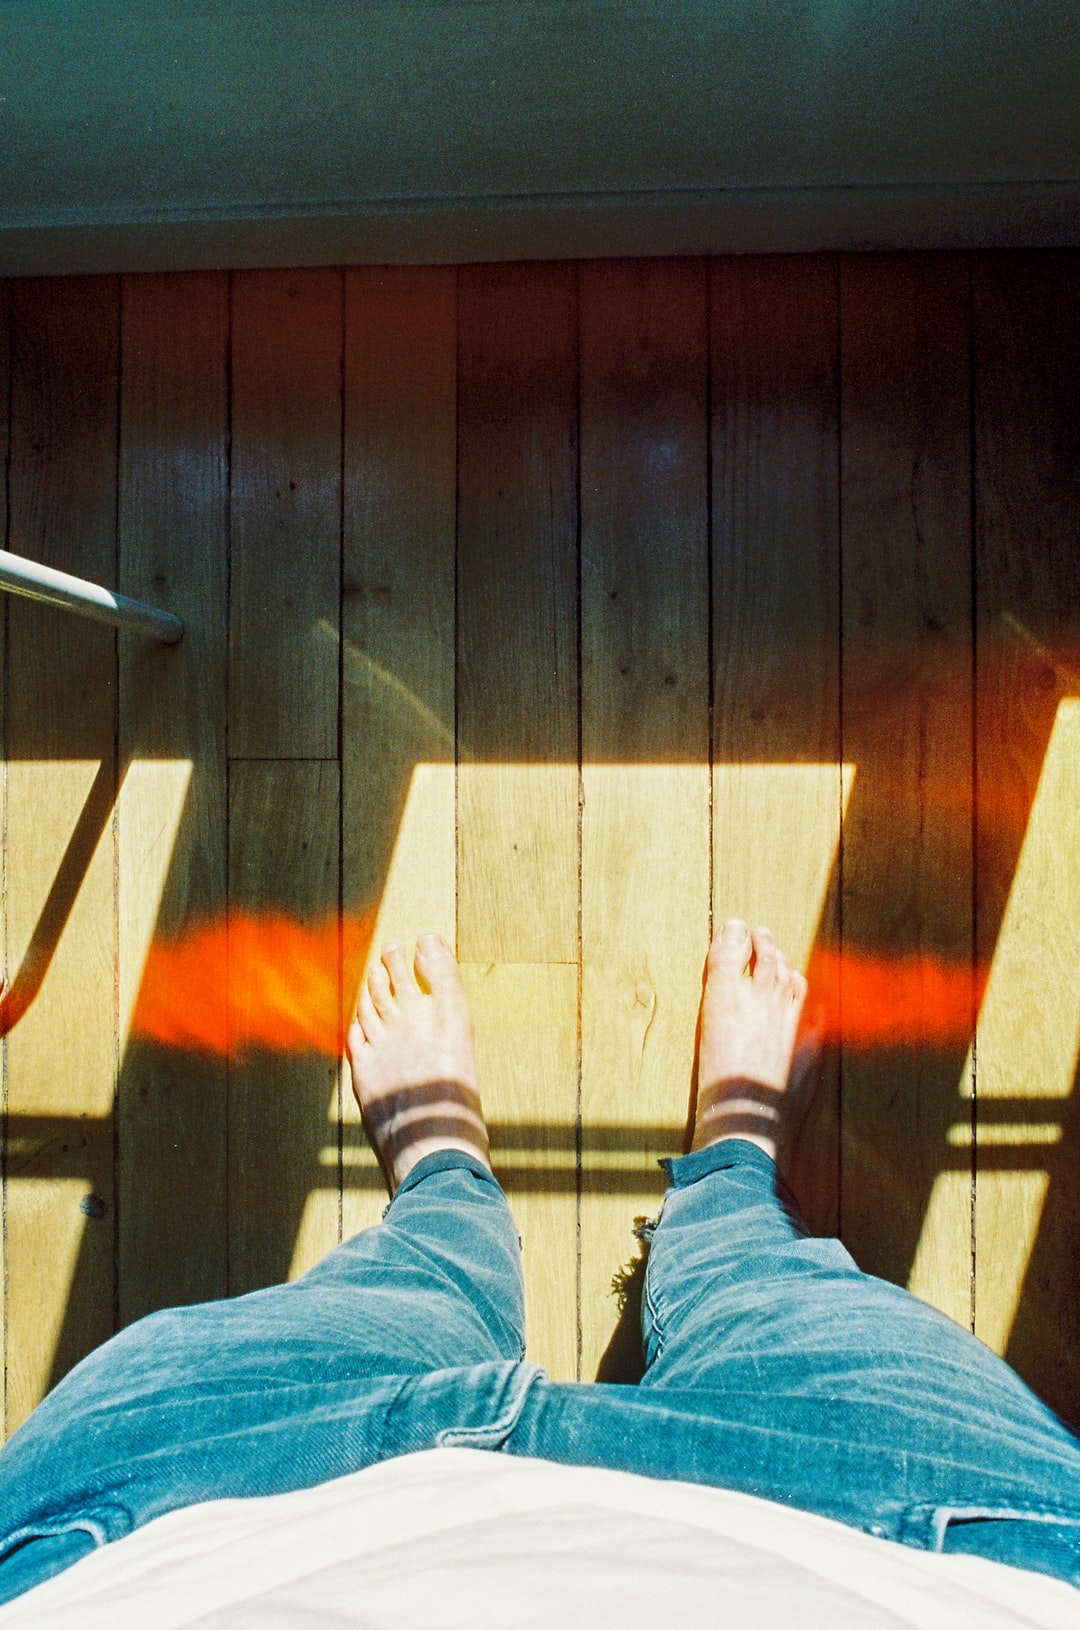 person in blue denim jeans standing on brown wooden floor